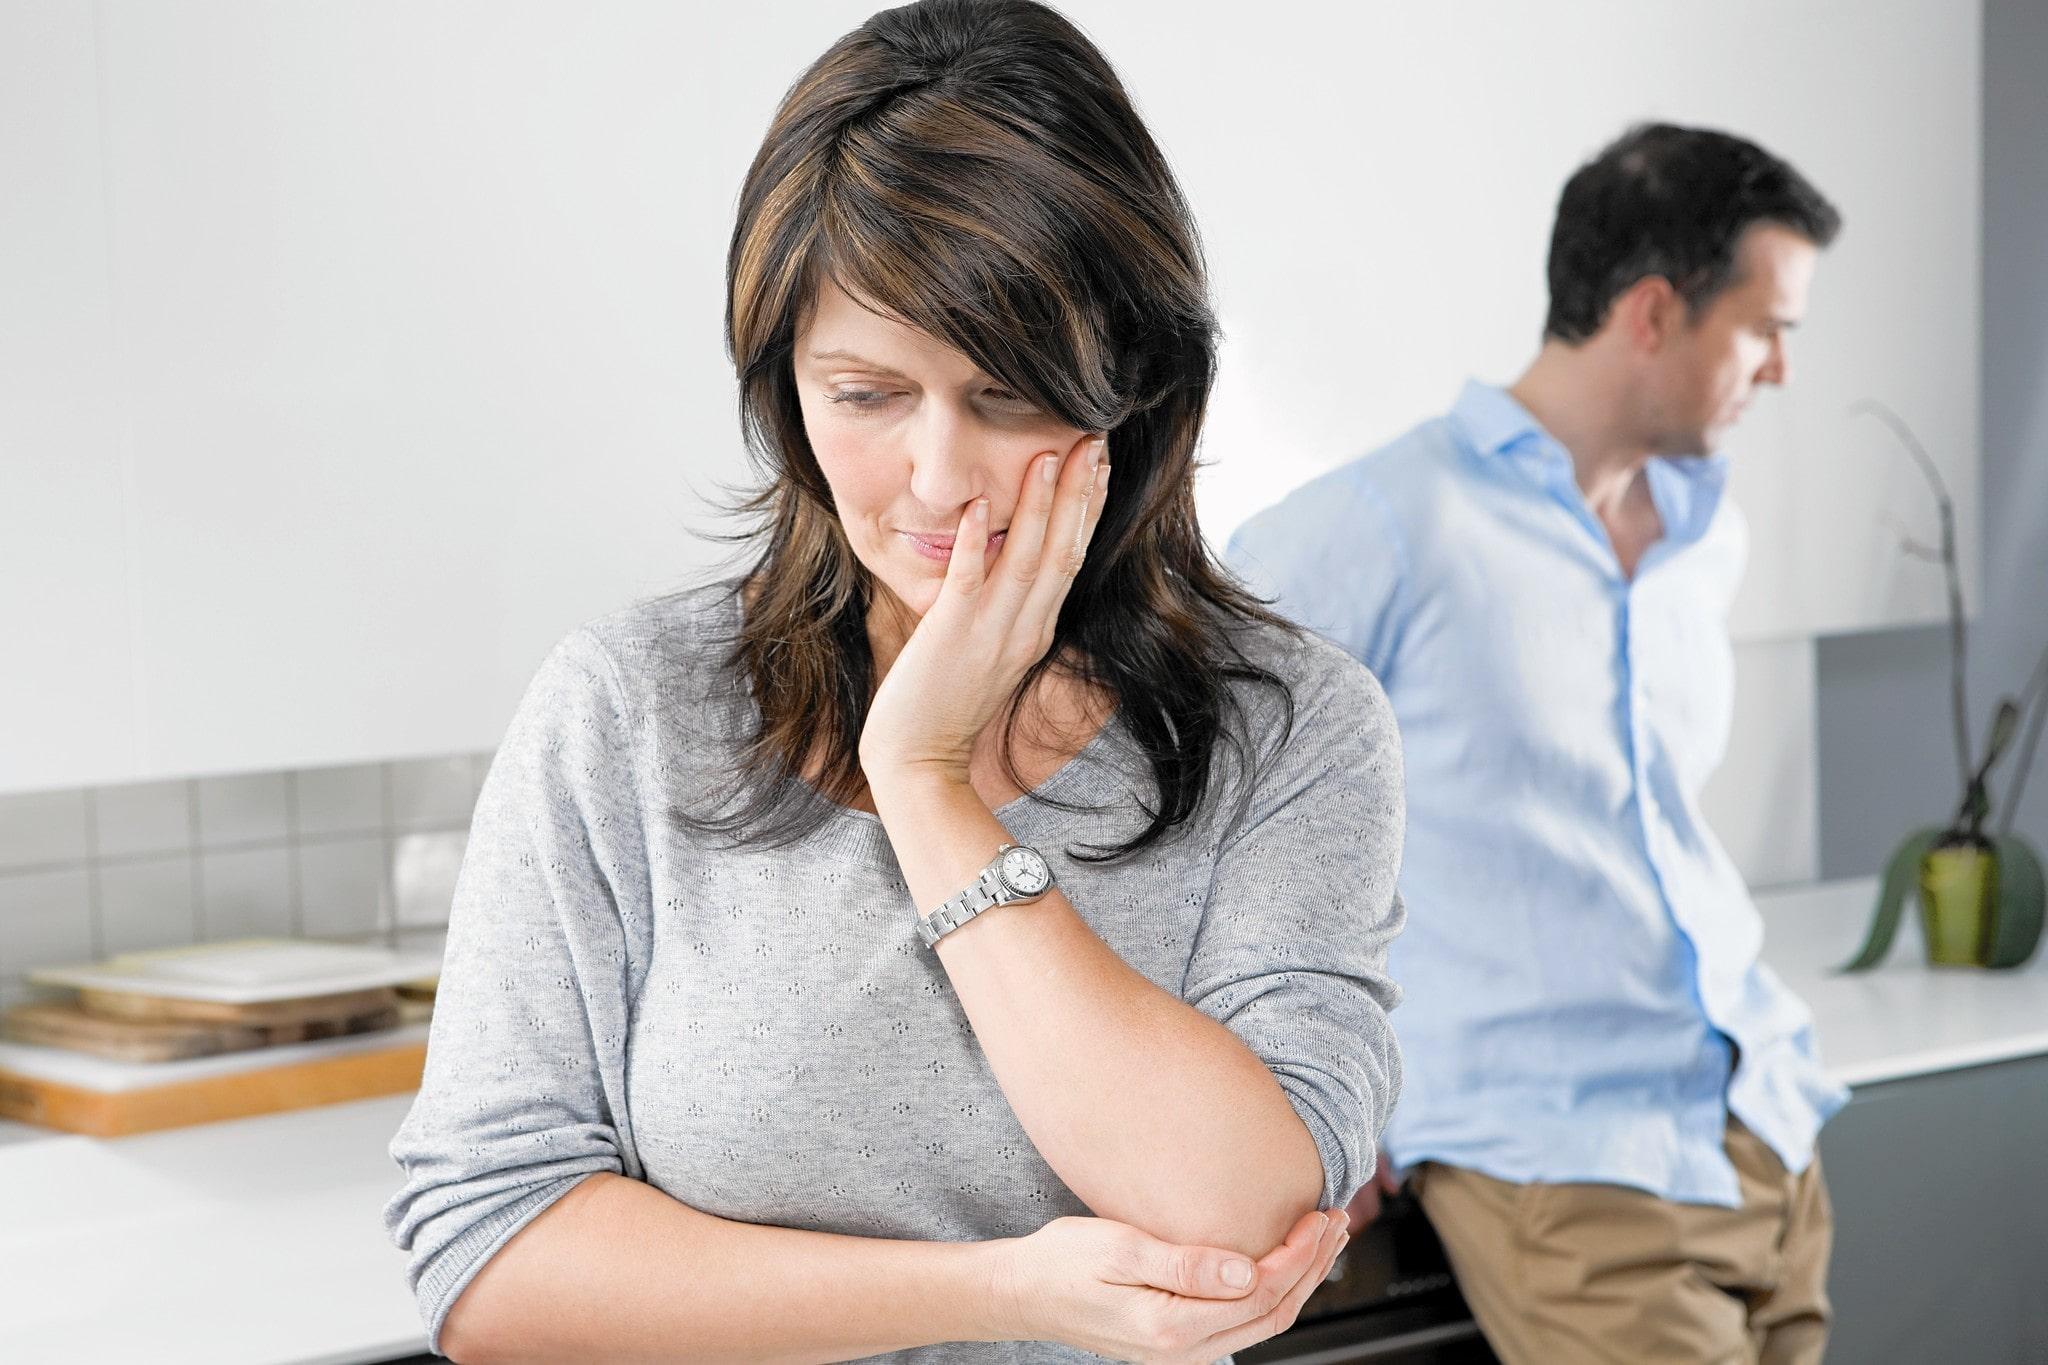 Оценка имущества при разводе фото